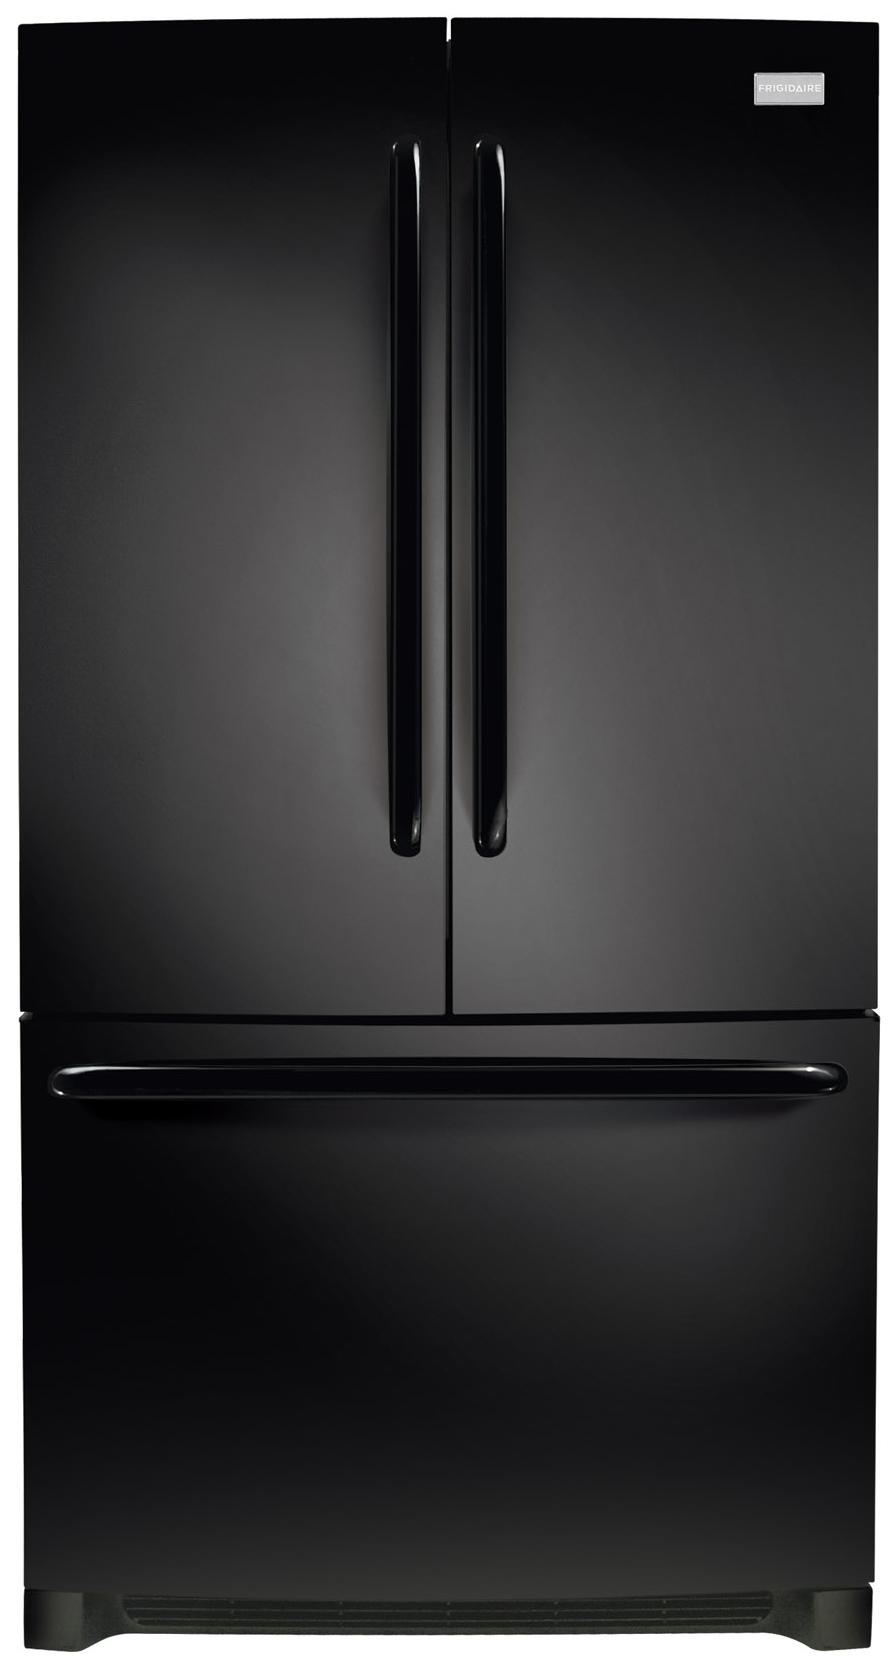 Frigidaire French Door Refrigerators 27.8 Cu. Ft. French Door Refrigerator - Item Number: FFHN2740PE